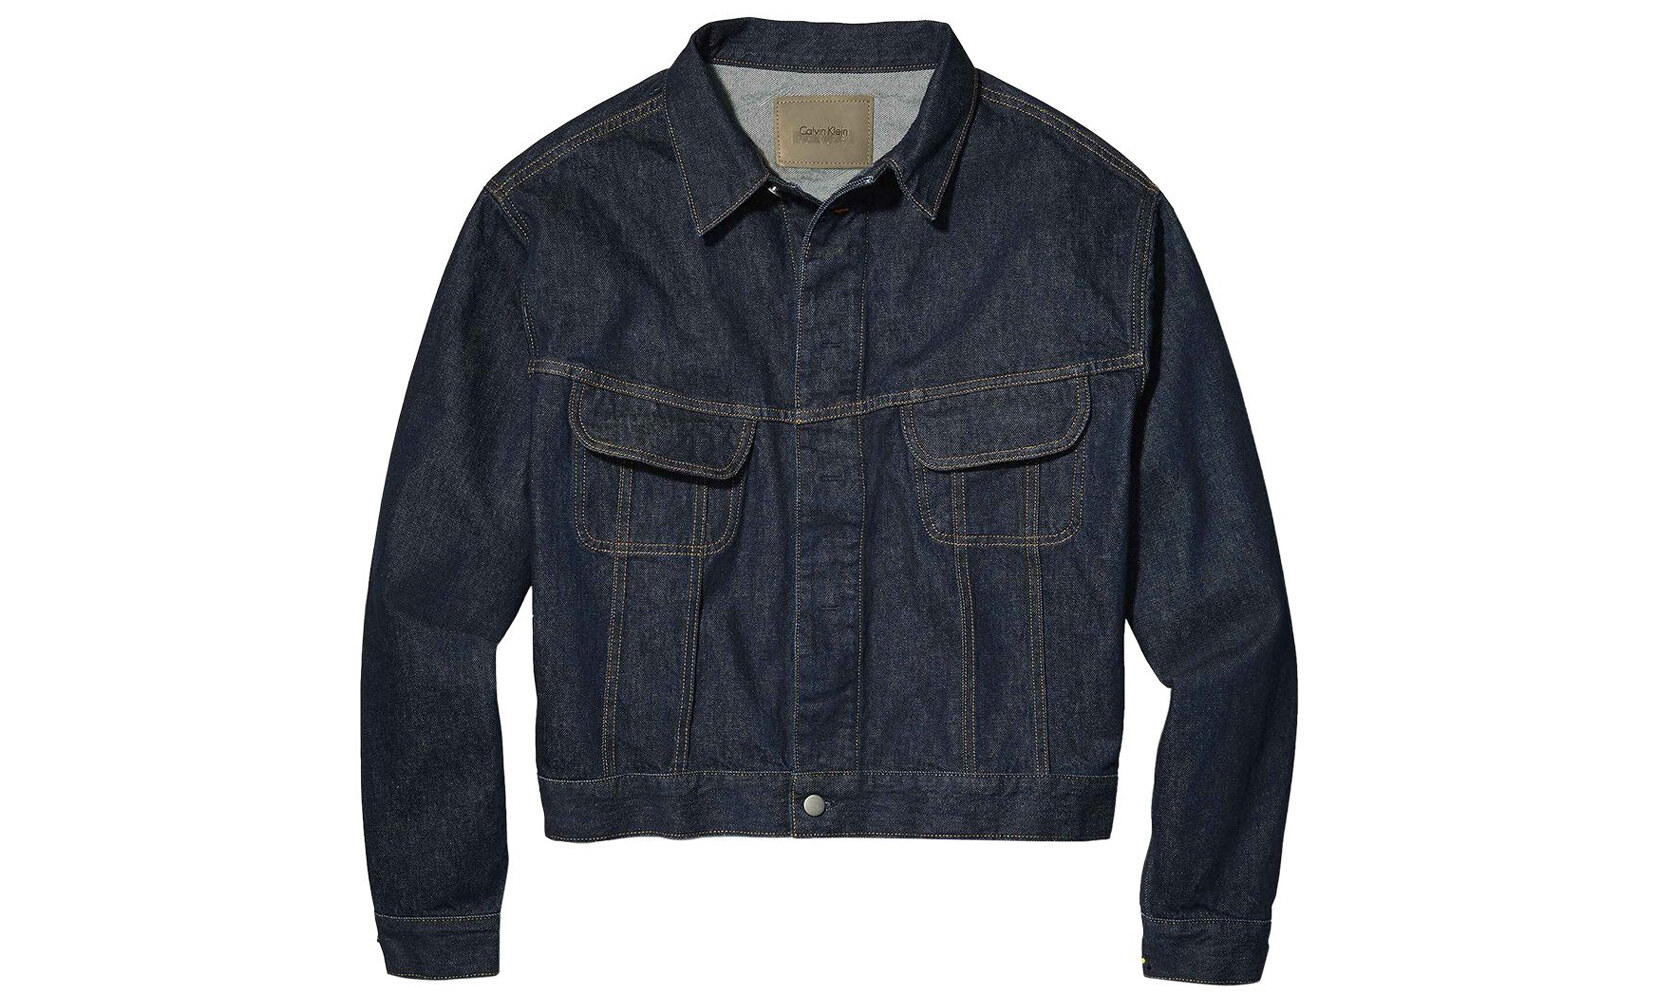 Heron Preston x Calvin Klein giacca in jeans